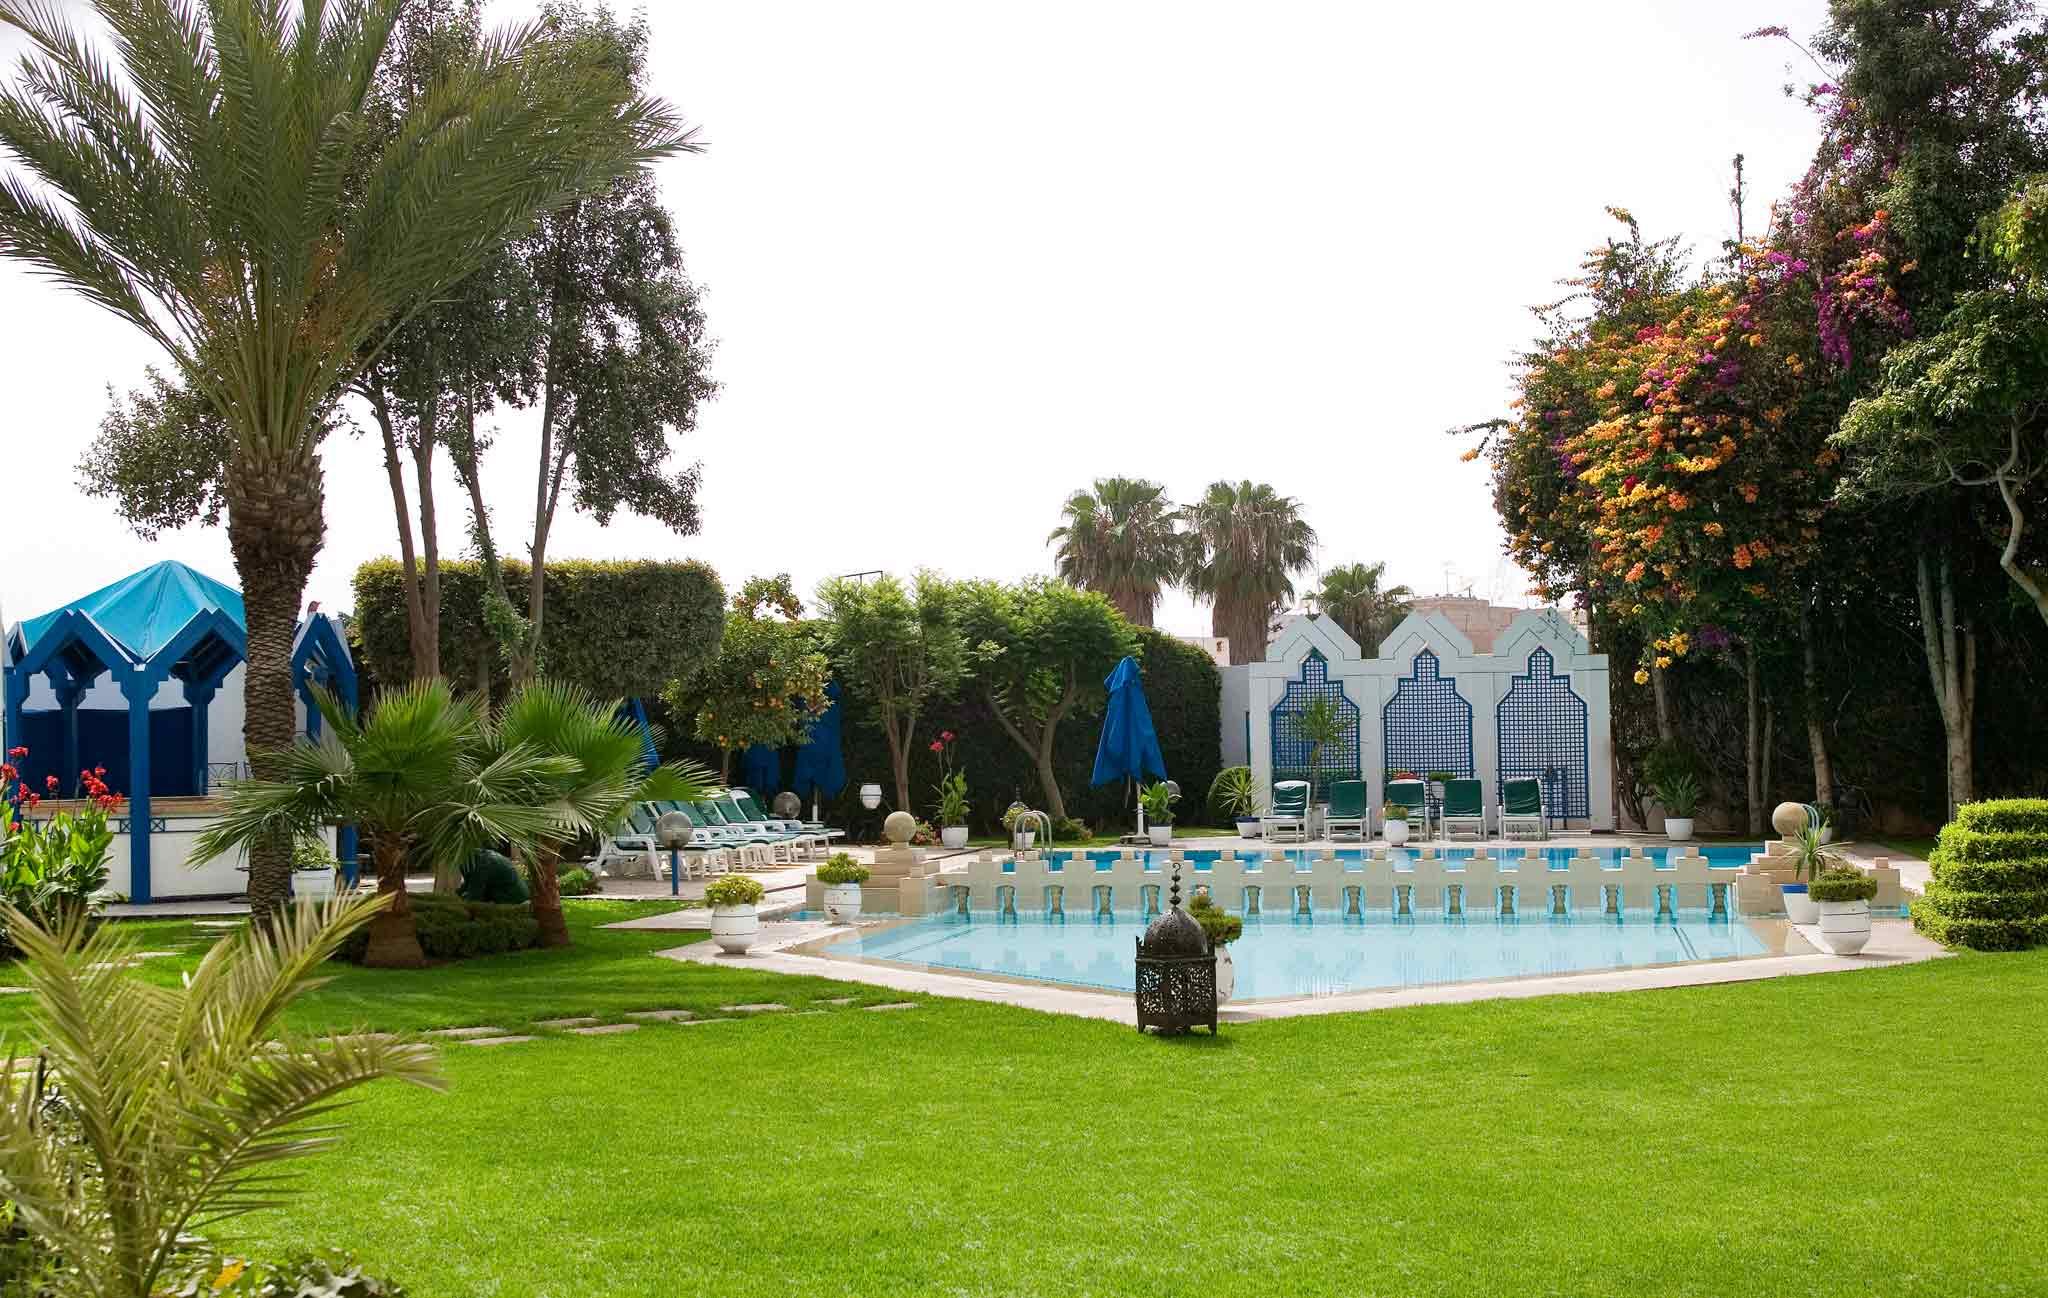 Ibis Moussafir Agadir Vue extérieure